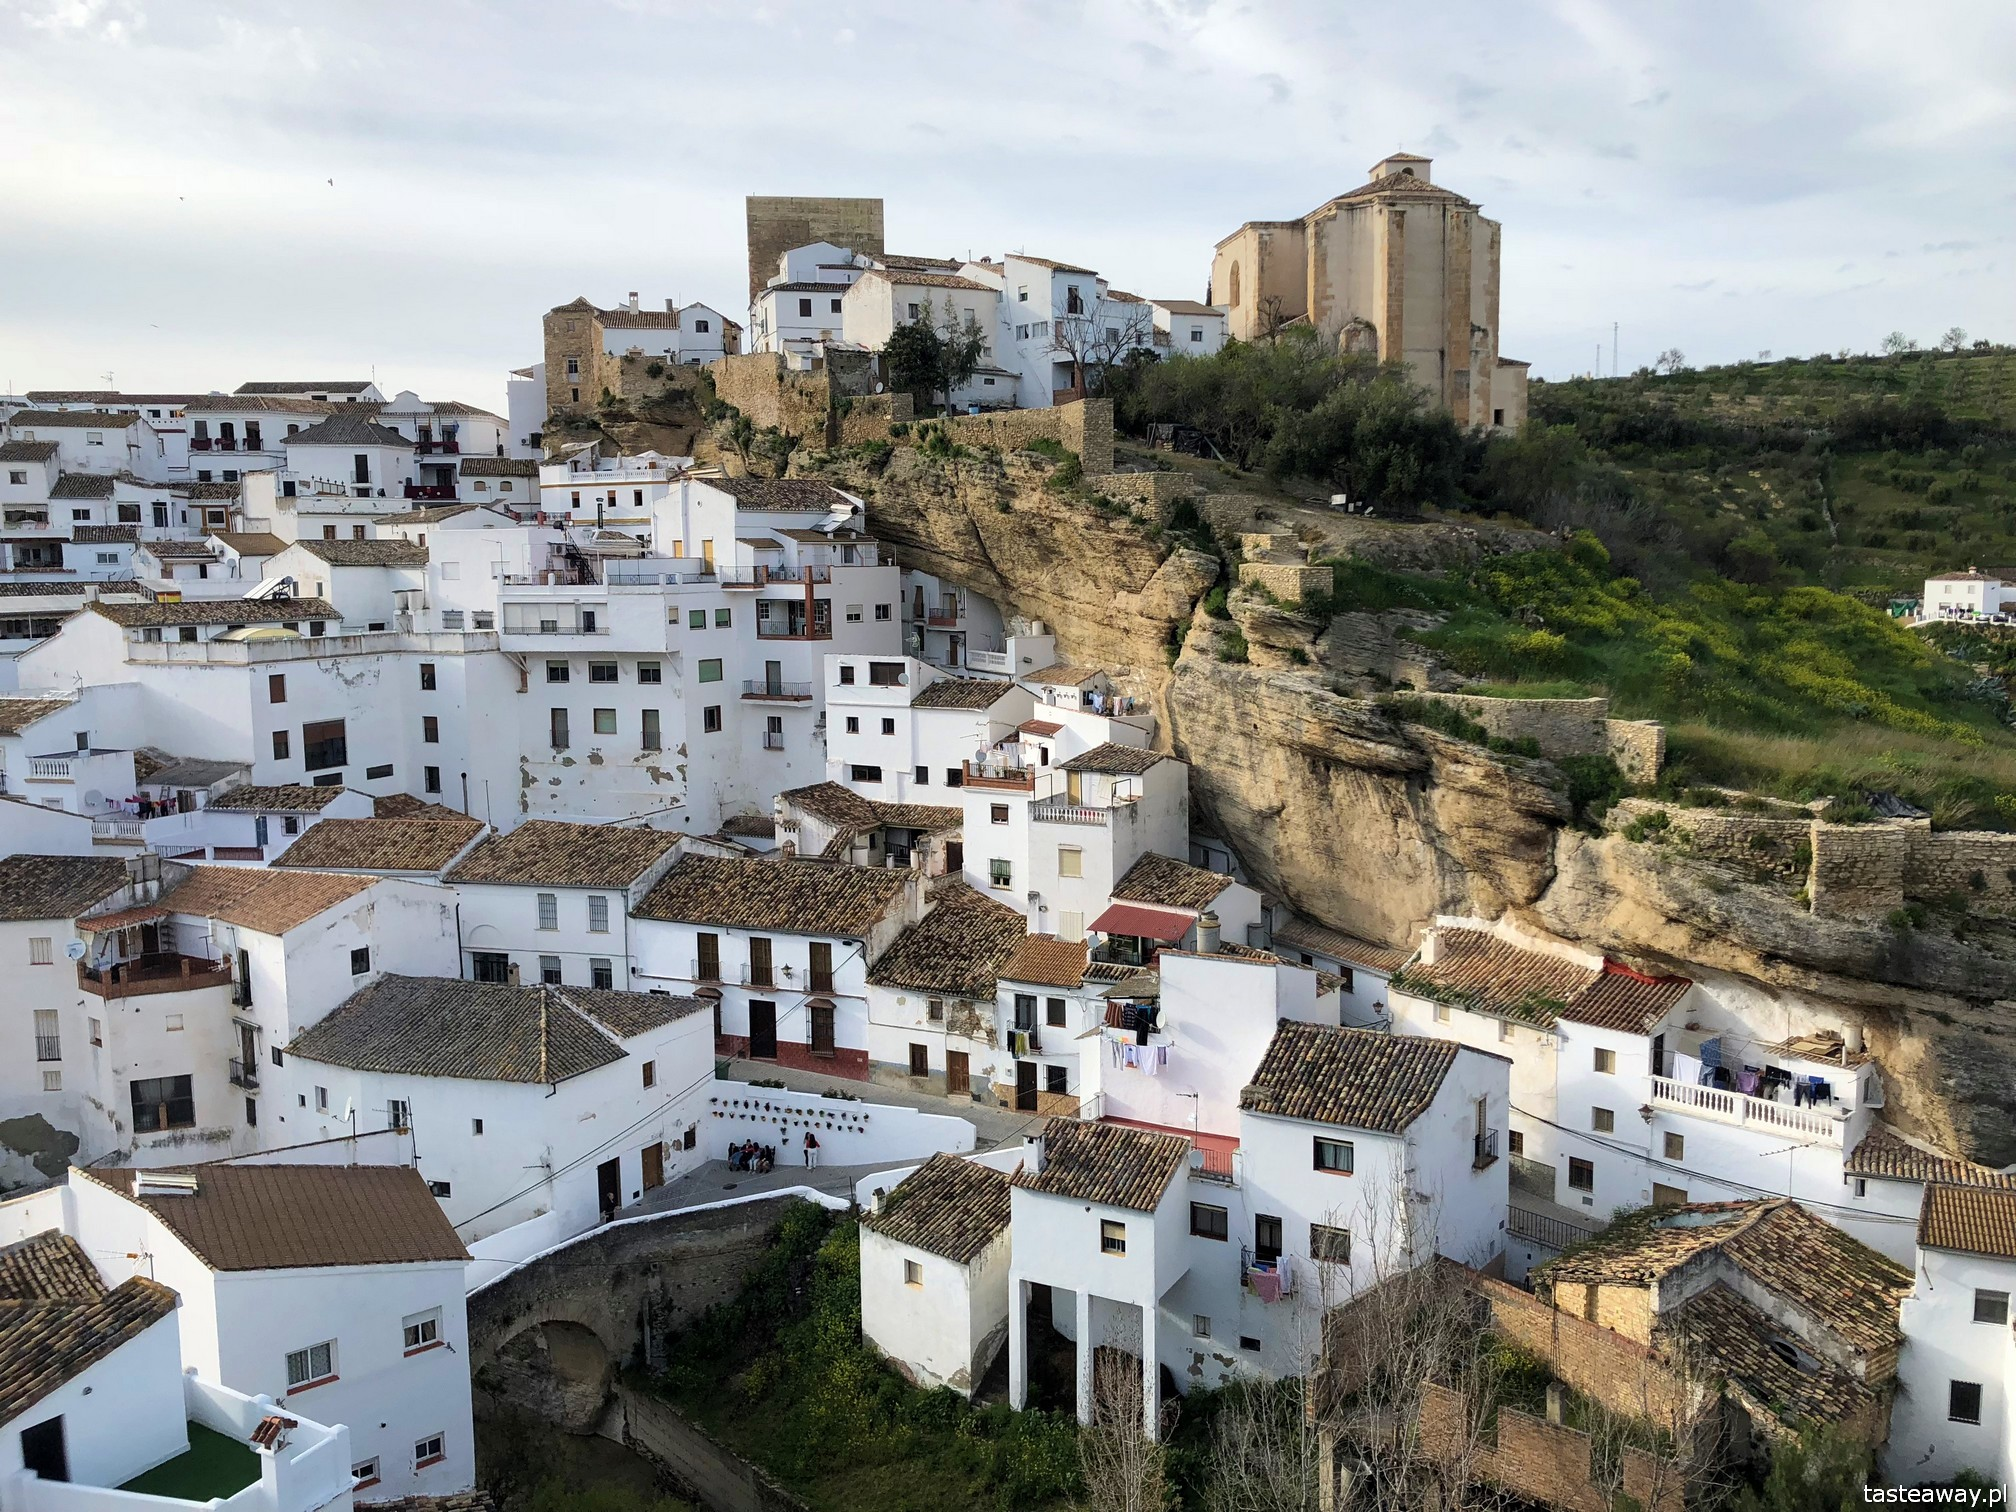 Andaluzja, najpiękniejsze miasteczka Andaluzji, pueblos blancos, co zobaczyć w Andaluzji, ruta de los pueblos blancos, Setenil de las Bodegas